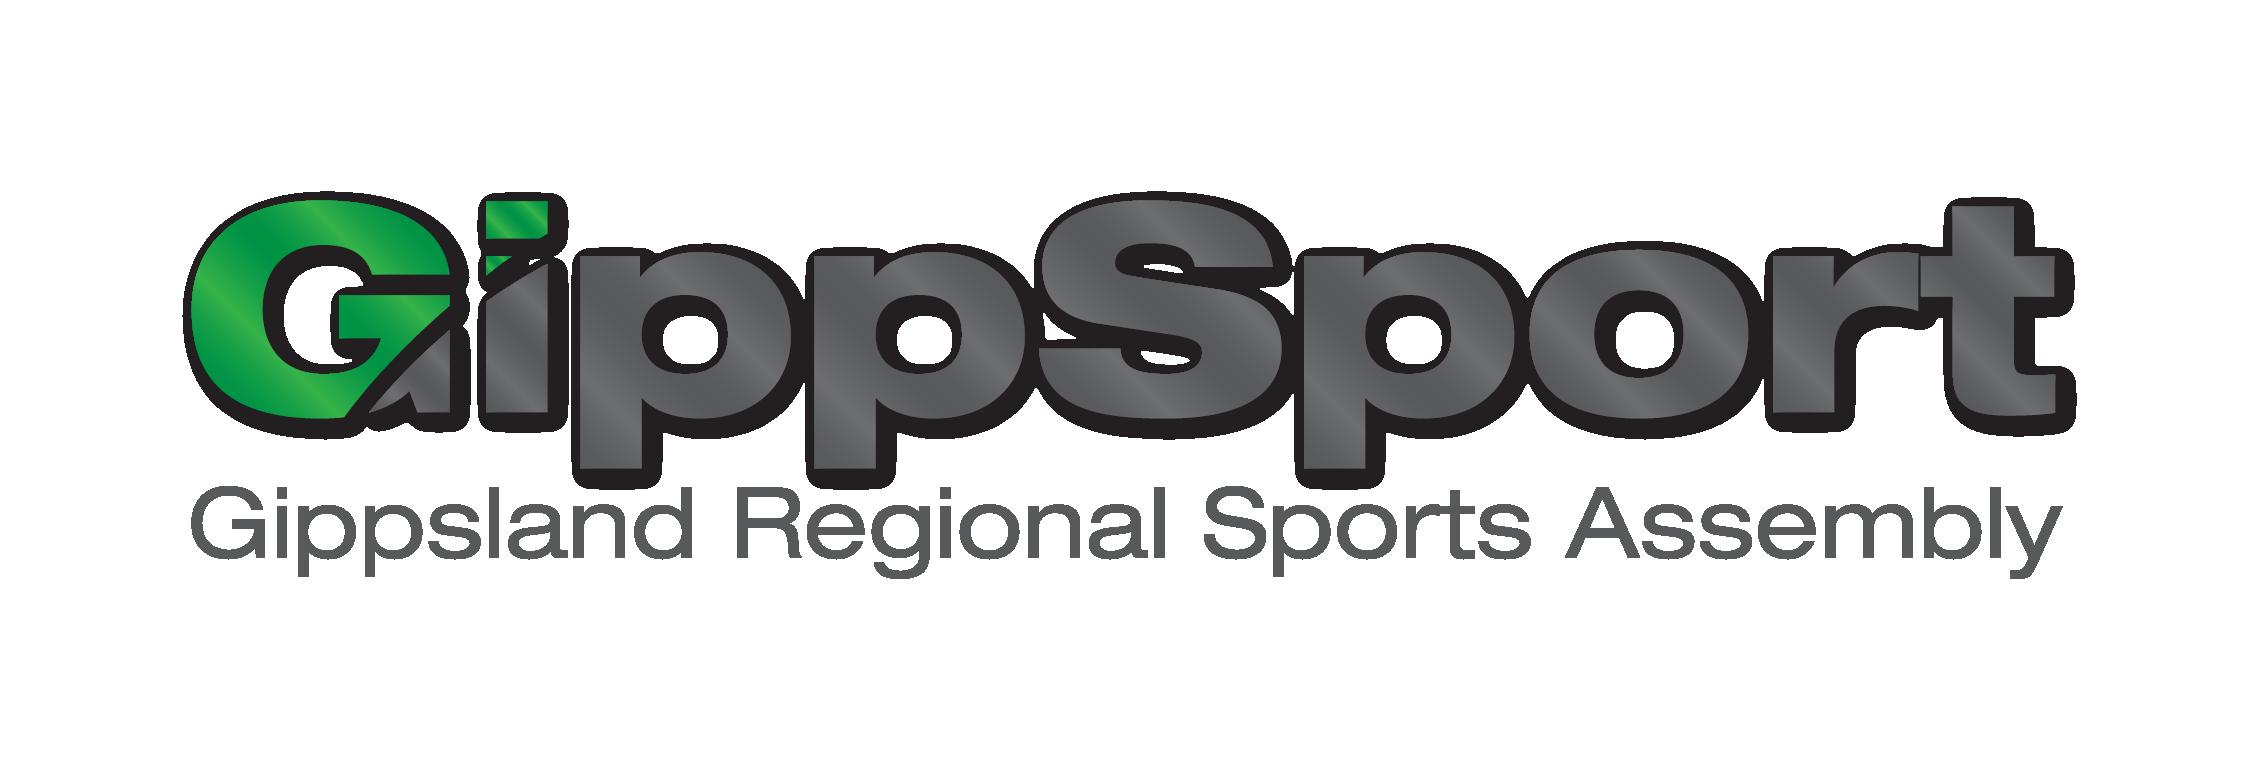 GippSport Inc